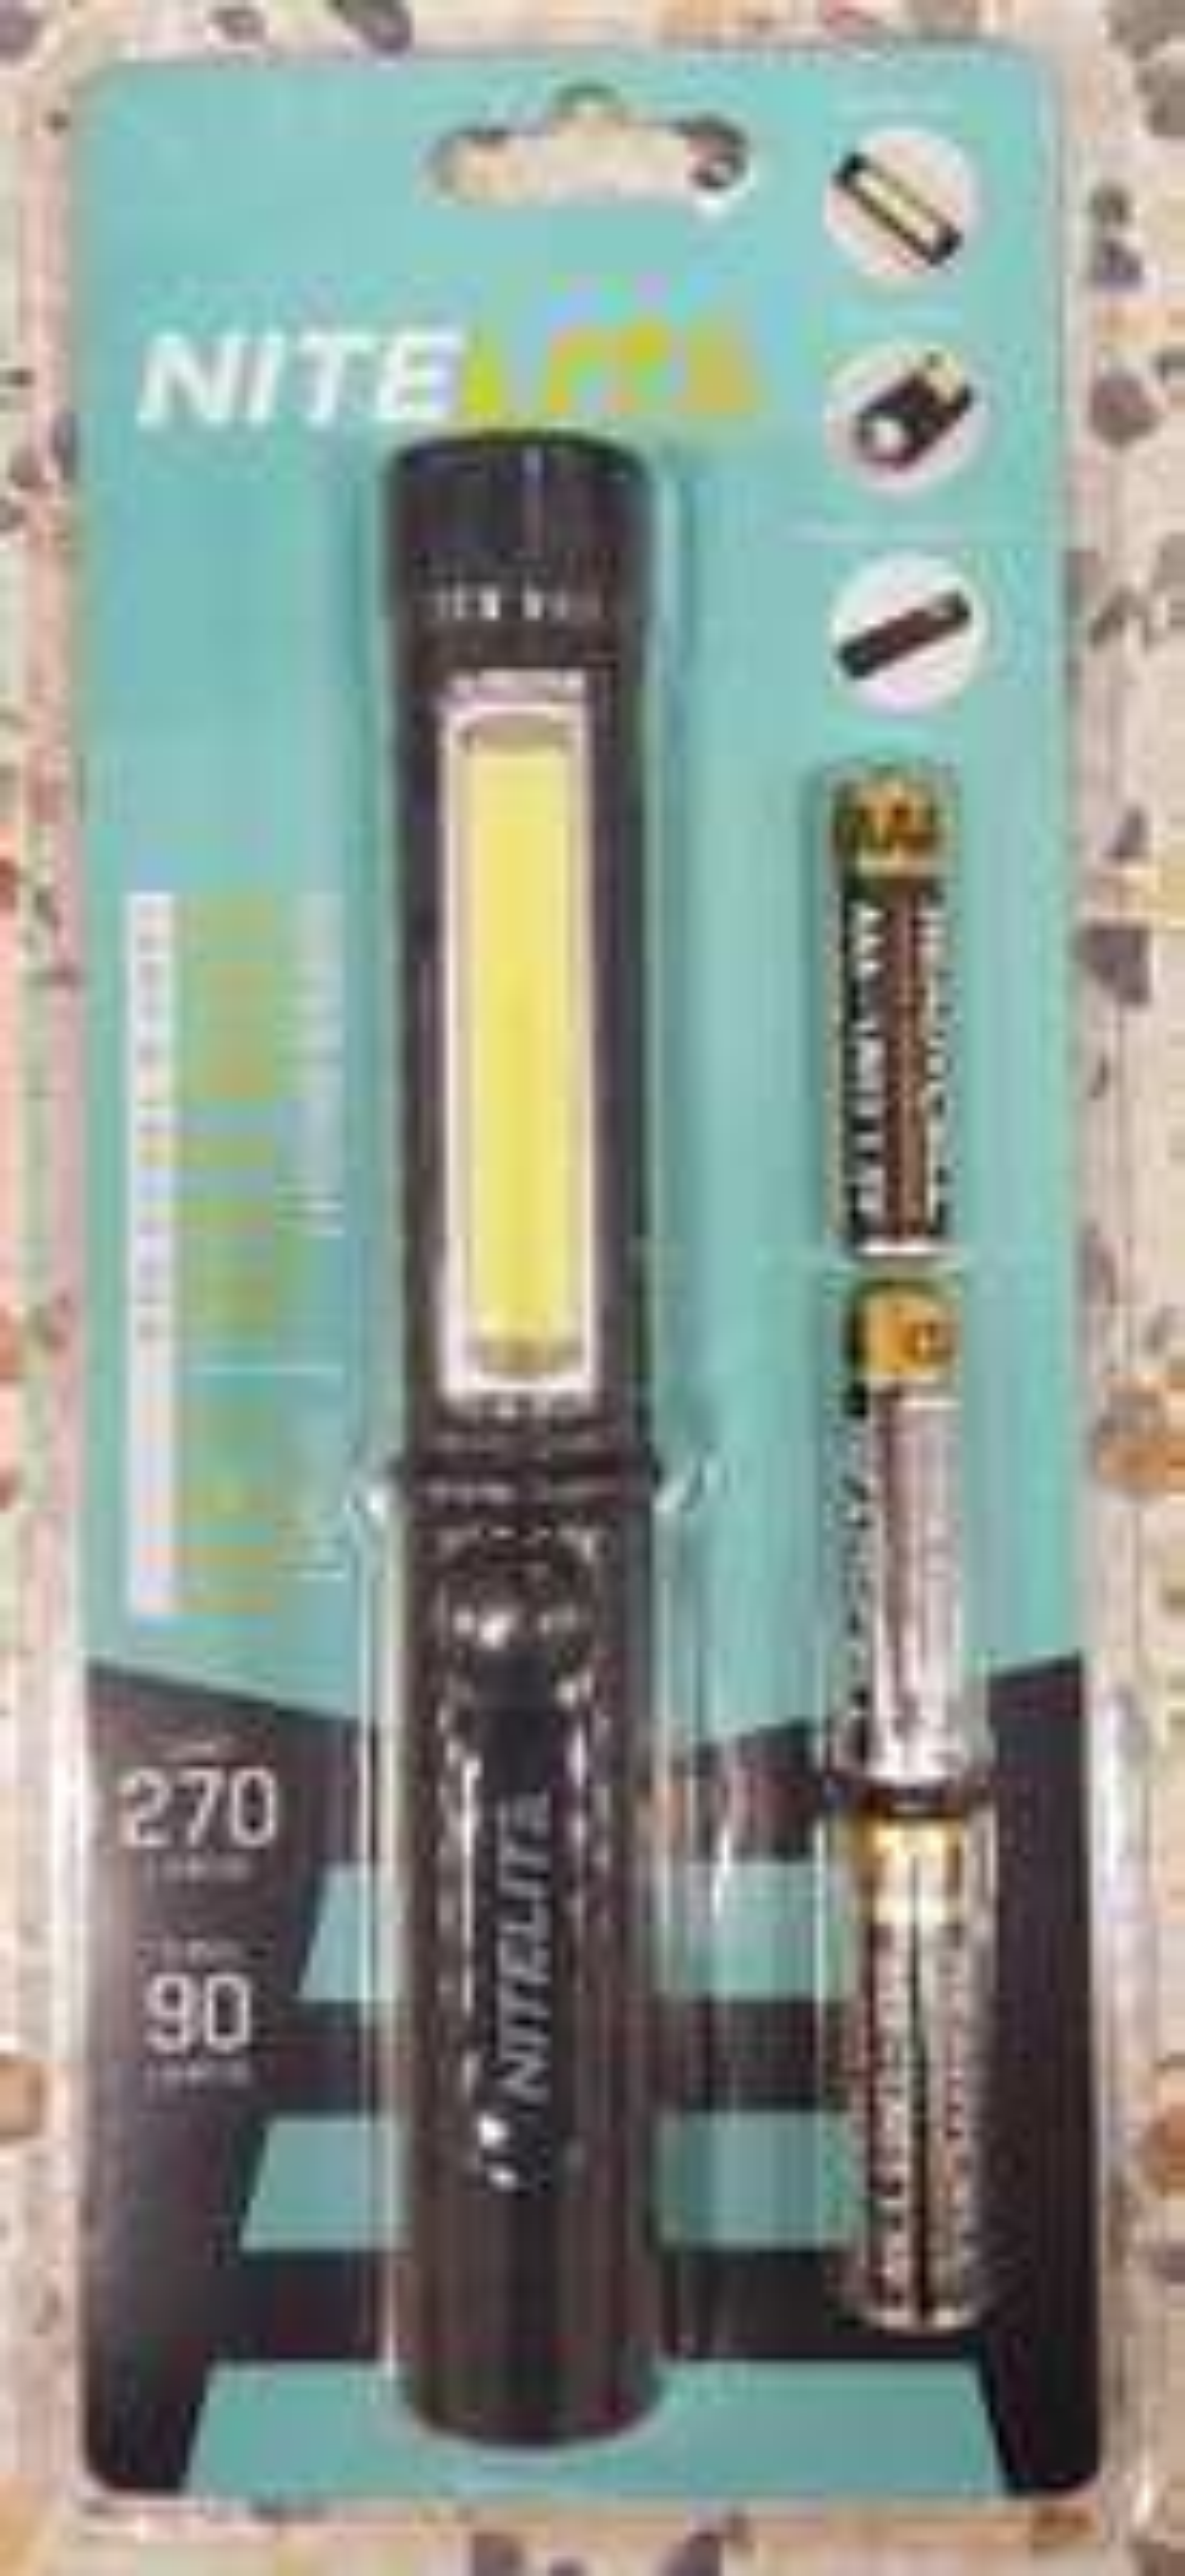 HOME BARGAINS INSTORE: COB LED Lamp & Pen Torch (270lm/90lm): £1.99